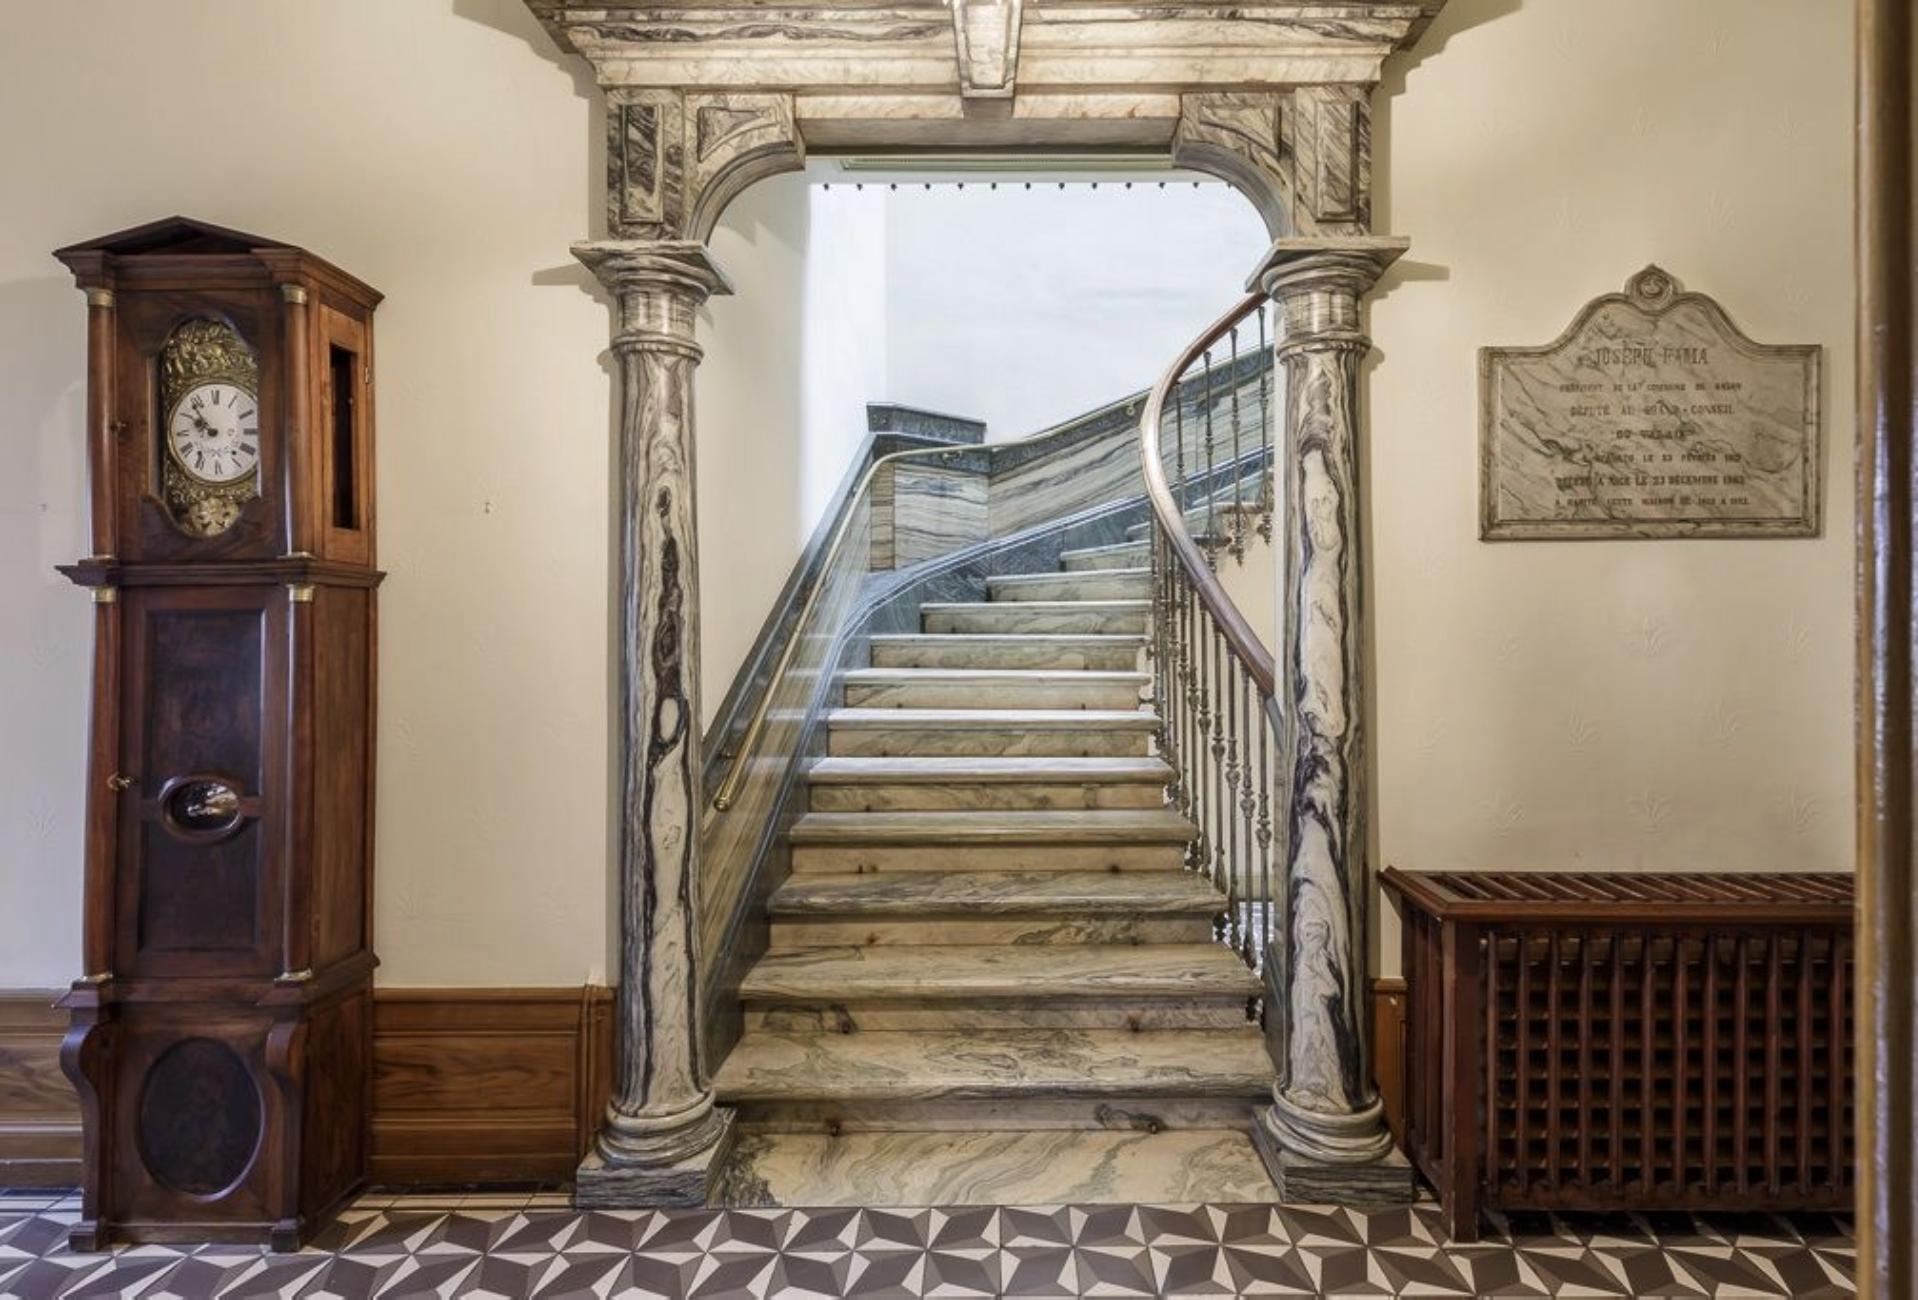 Les escaliers en marbre de Saillon de la villa Fama